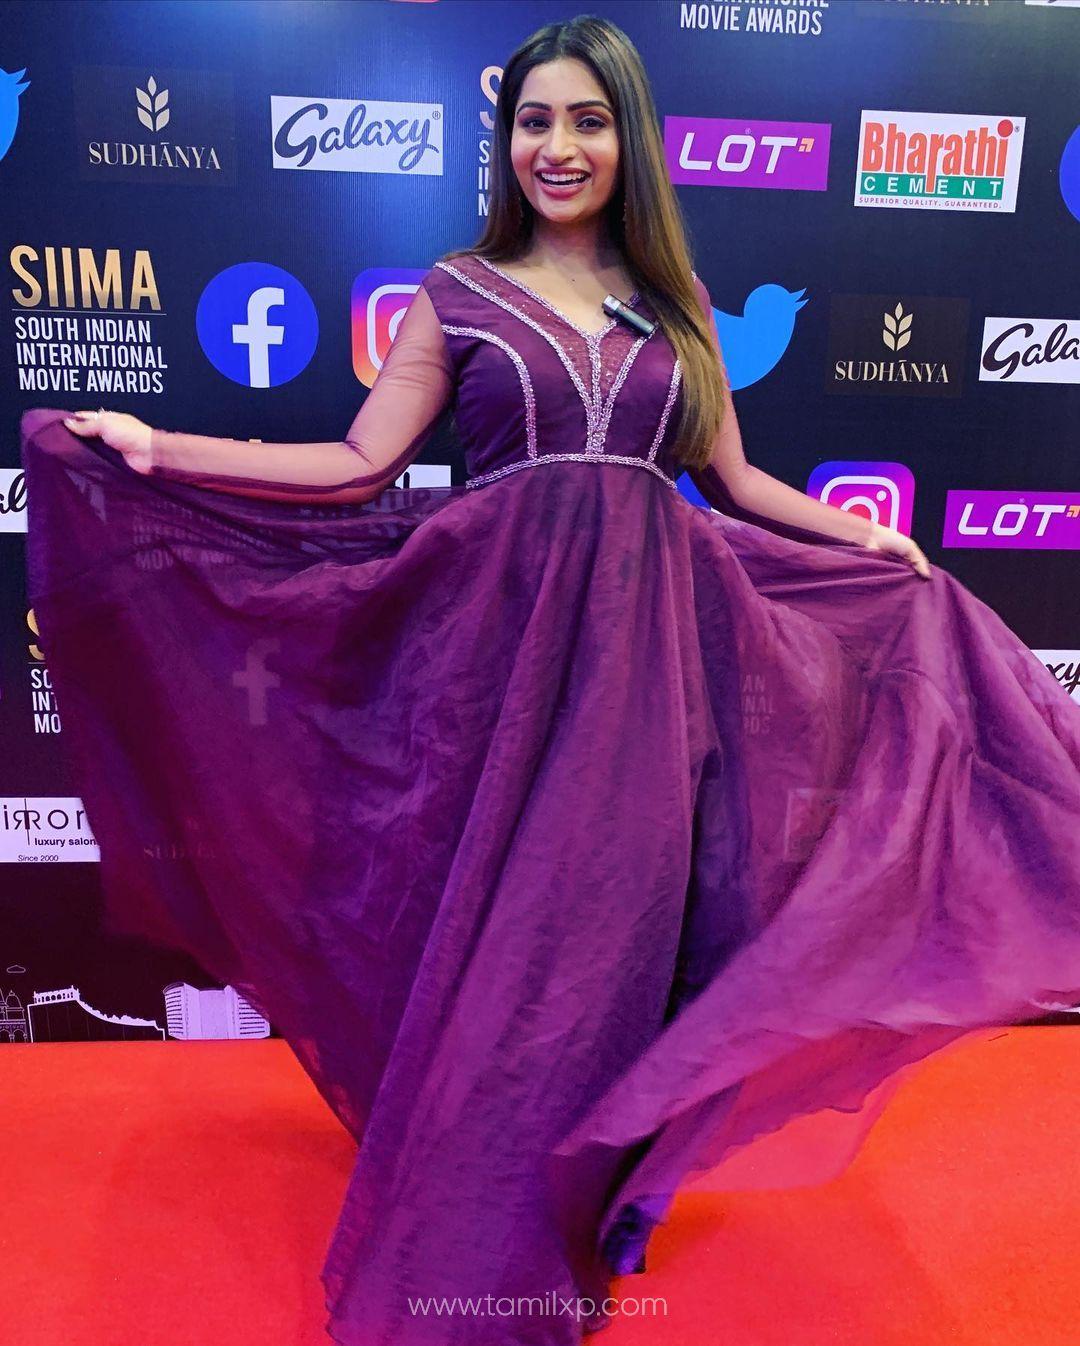 actress nakshathra nagesh instagram